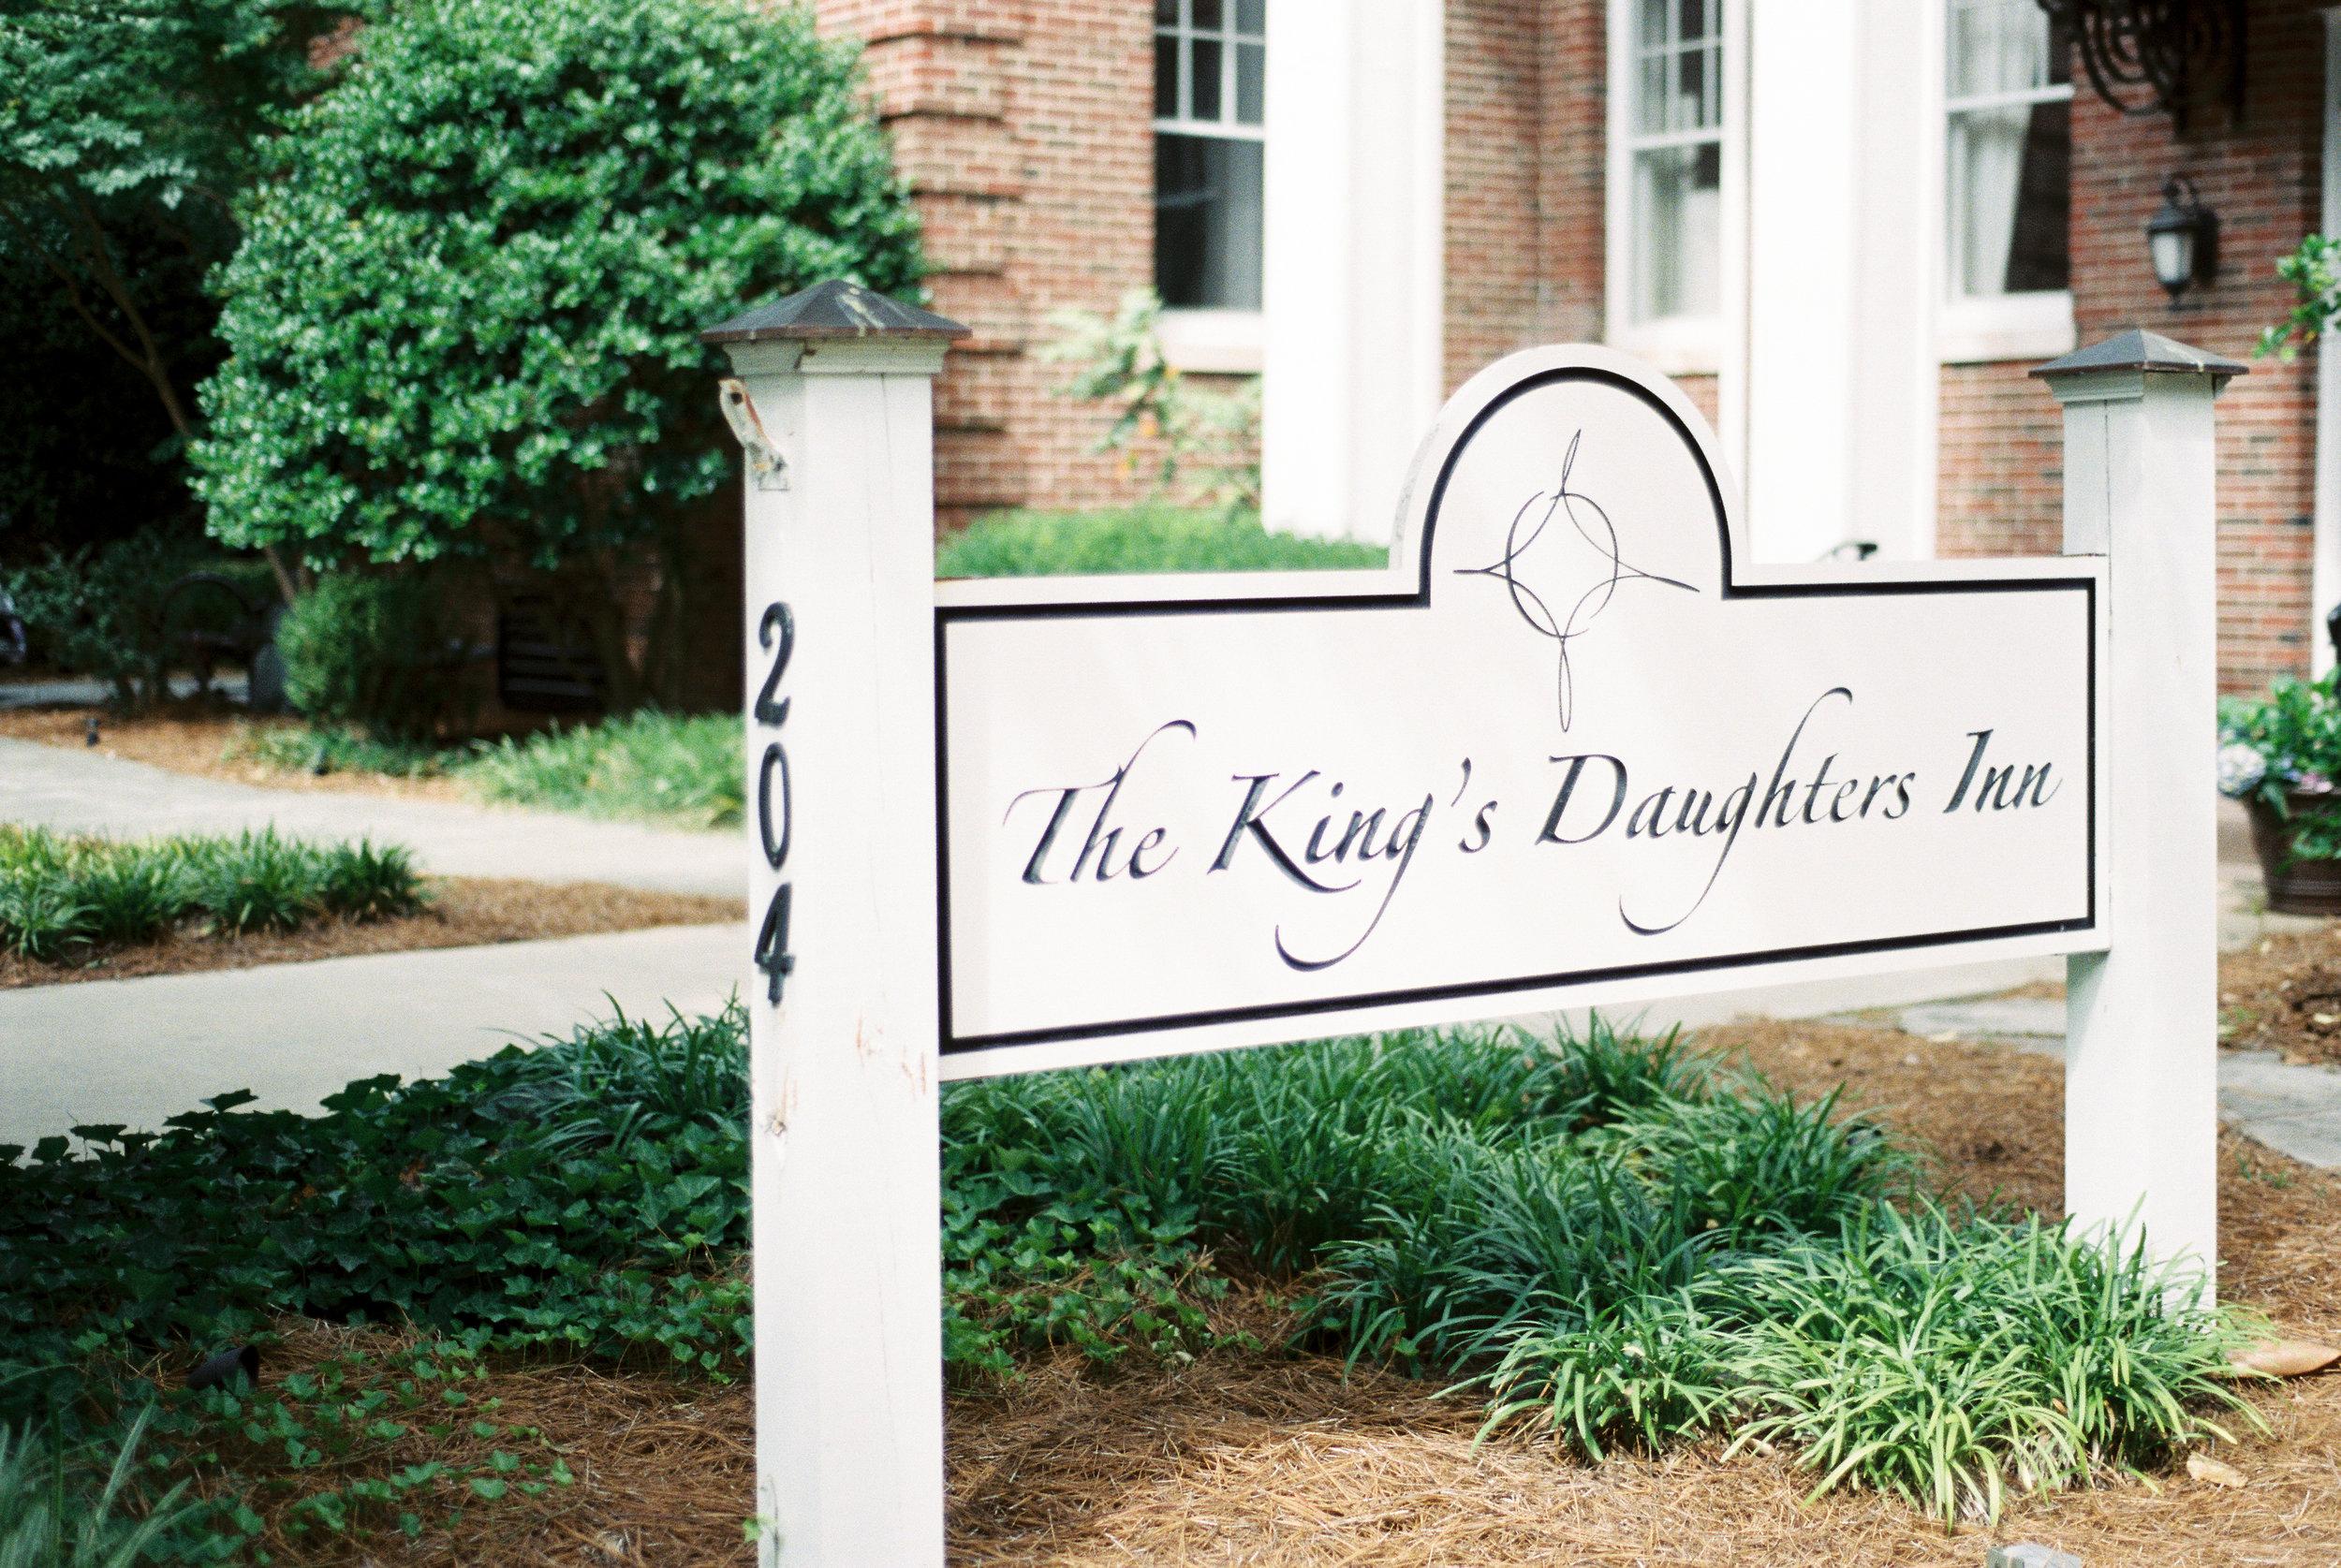 The King's Daughters Inn - Founded 2009Deanna Crossman, OwnerWEBSITE   FACEBOOK   INSTAGRAMfunctions@thekingsdaughtersinn.com919-354-7000